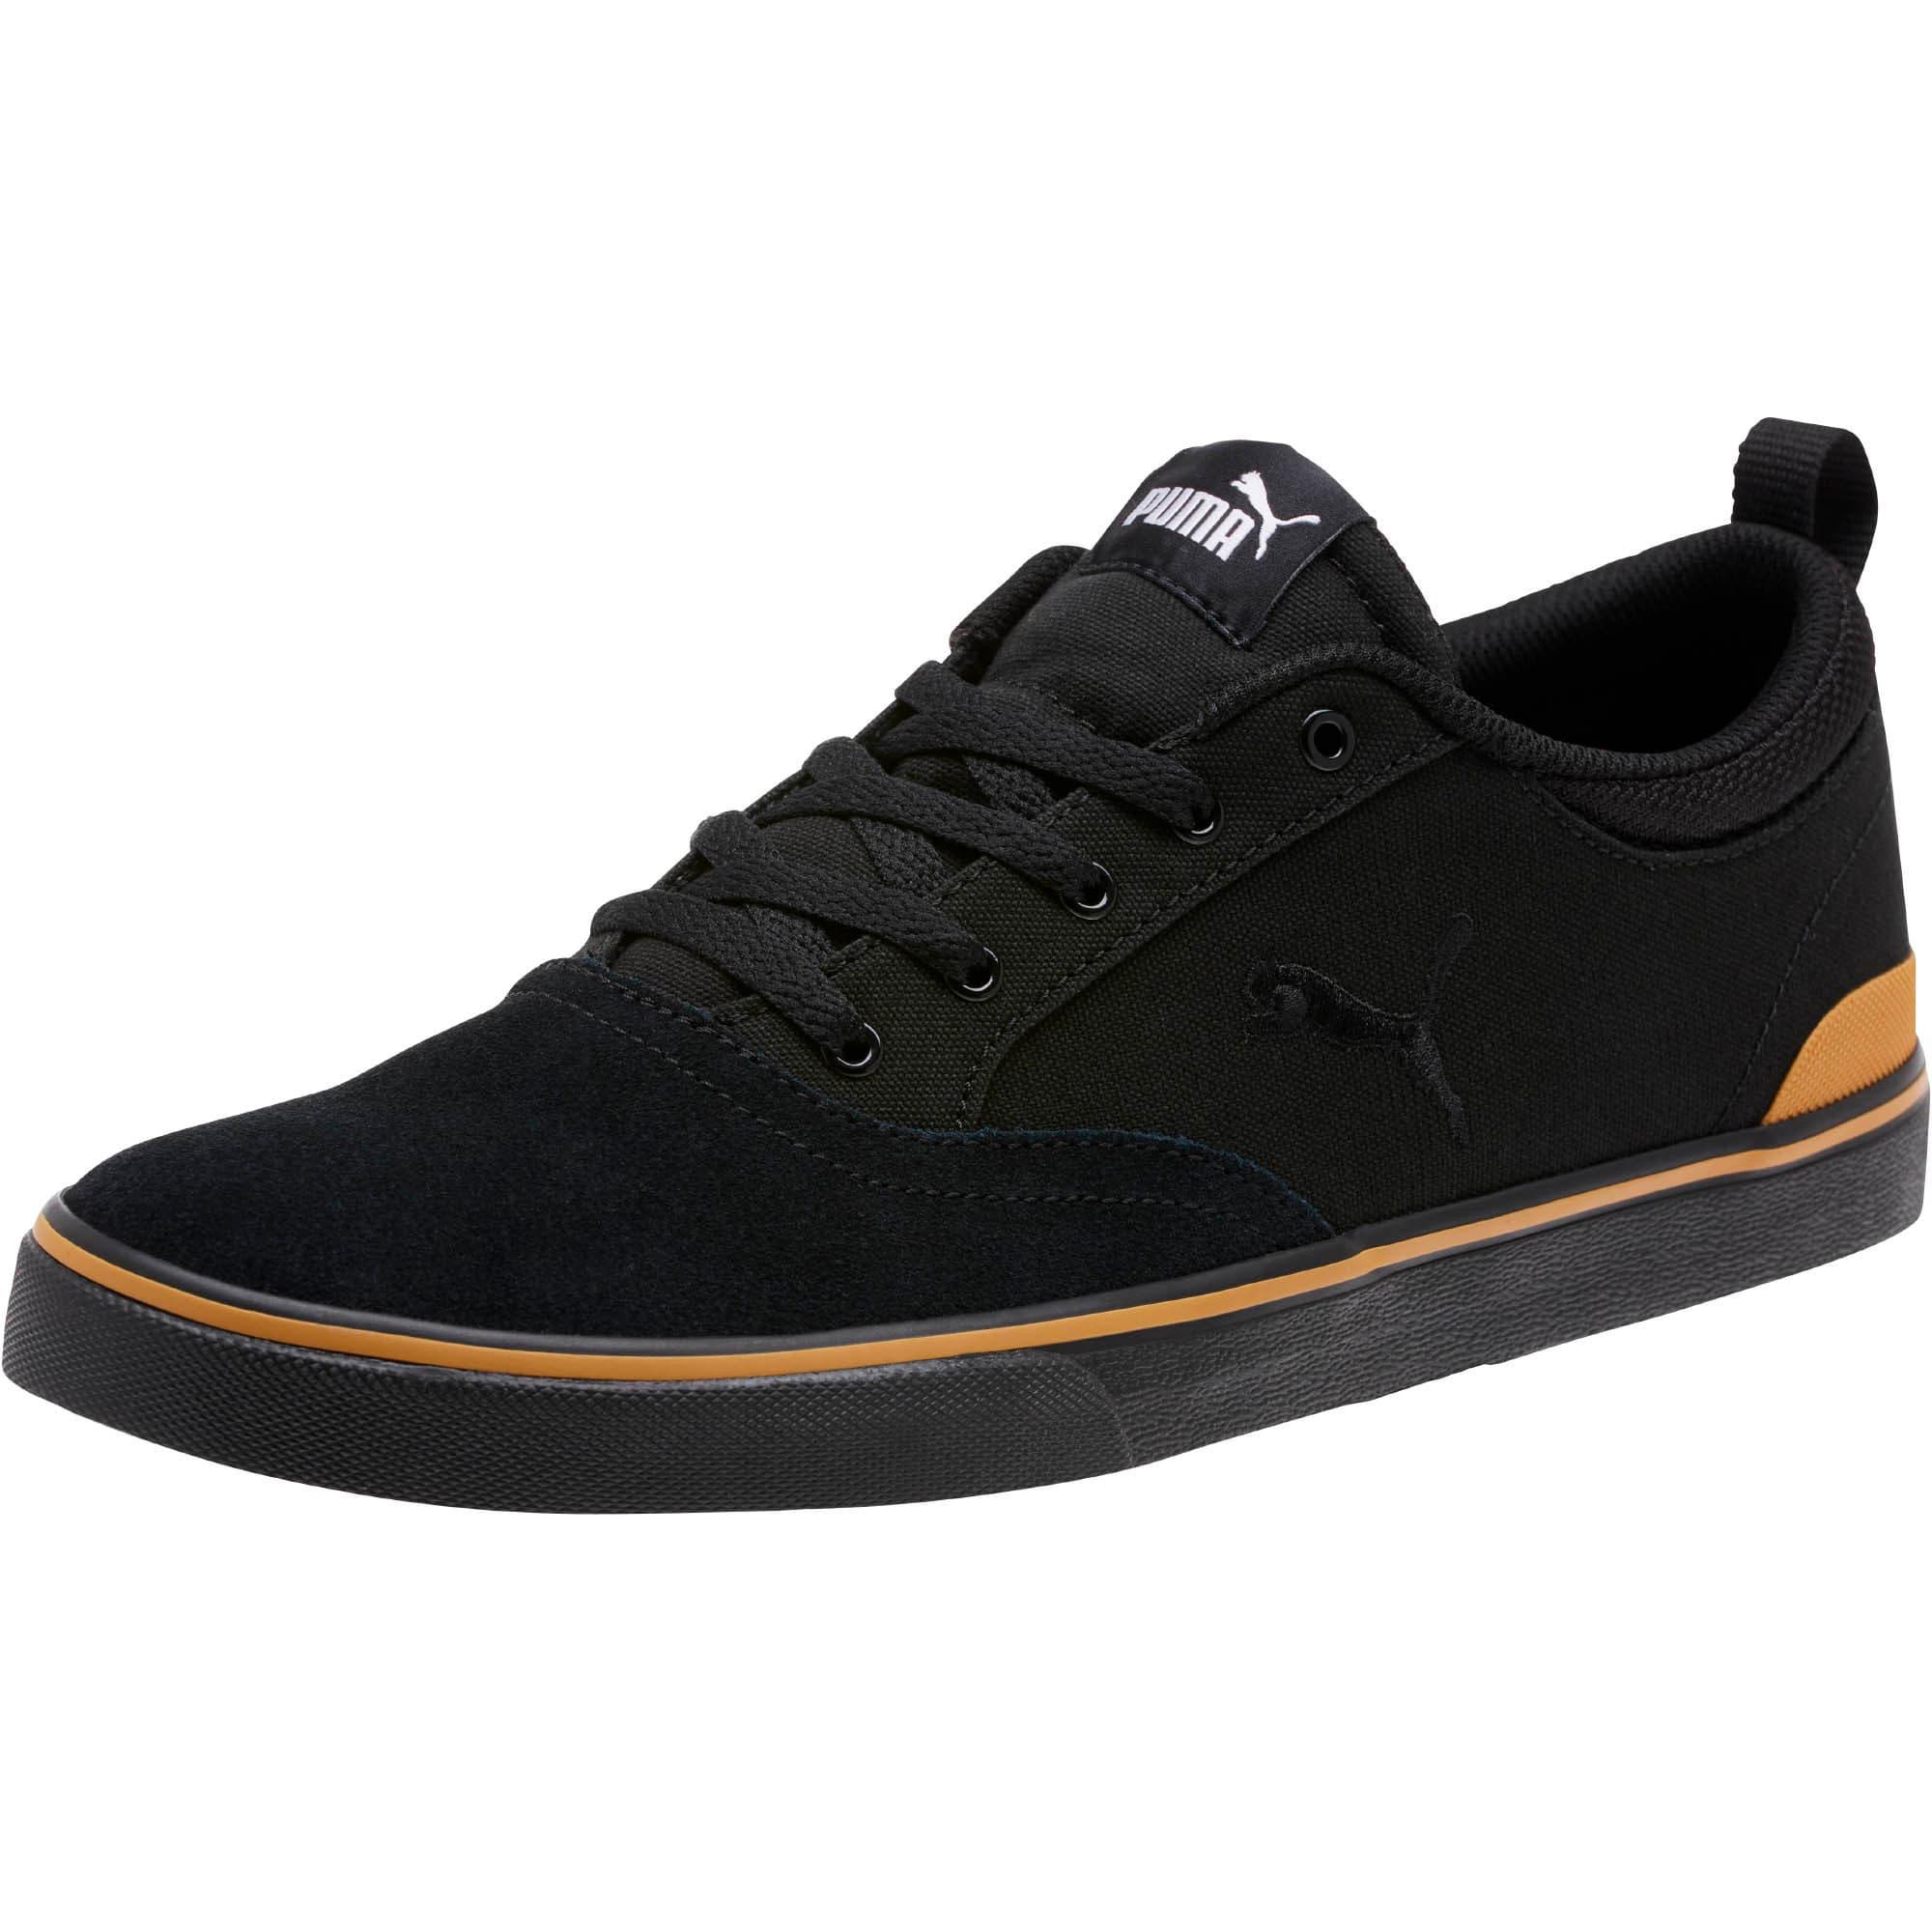 Thumbnail 1 of Puma Bridger Cat Men's Sneakers, Puma Black-Asphalt, medium